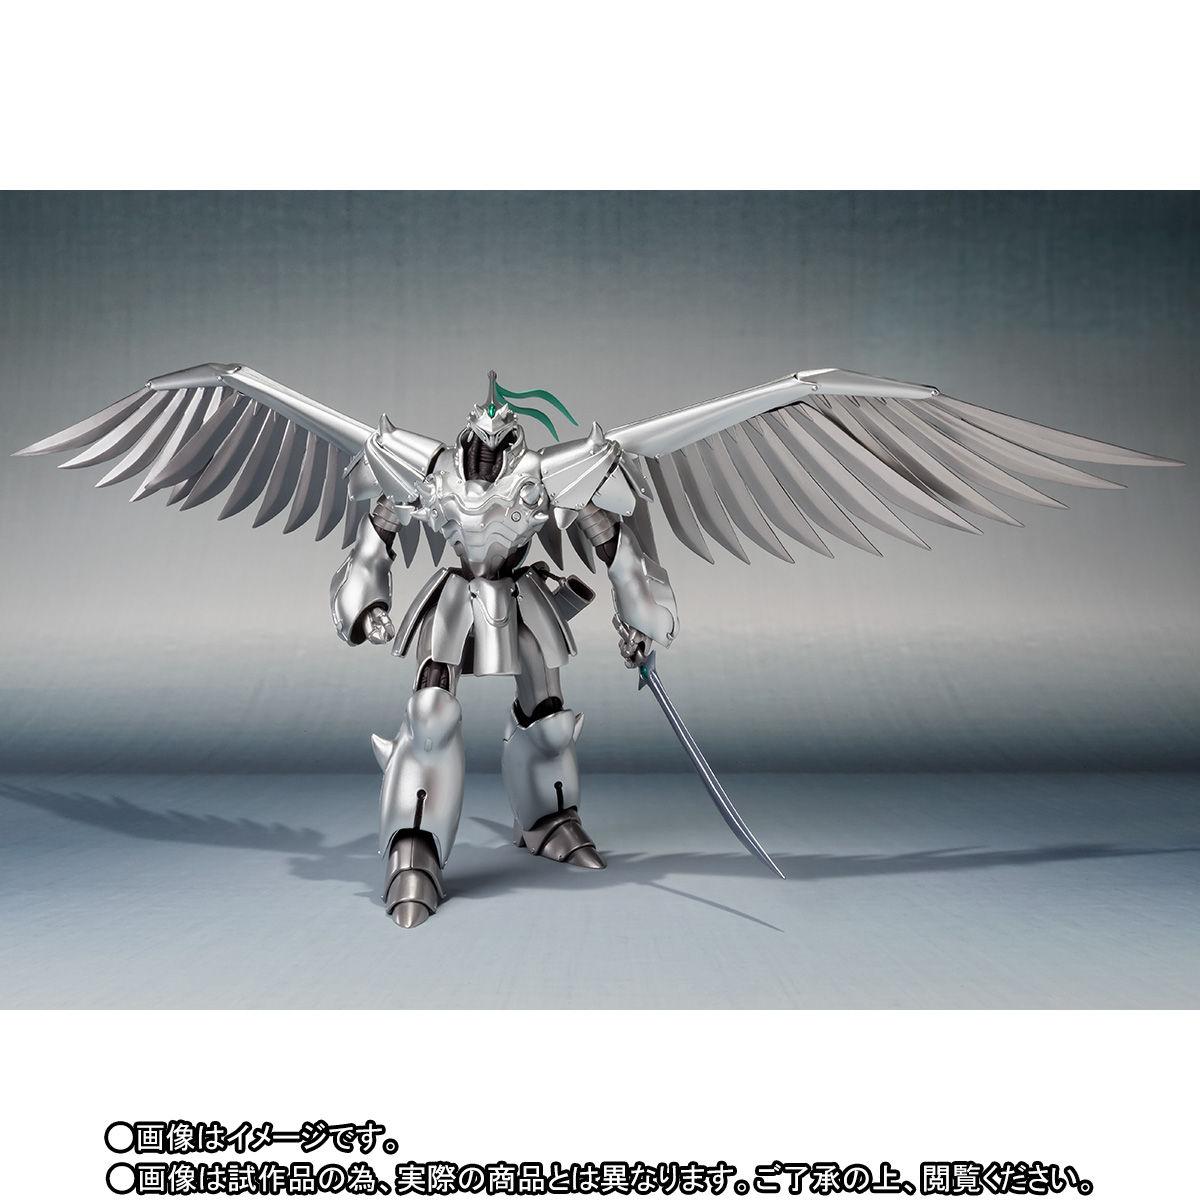 ROBOT魂〈SIDE PB〉『飛甲兵』機甲界ガリアン 鉄の紋章 可動フィギュア-003